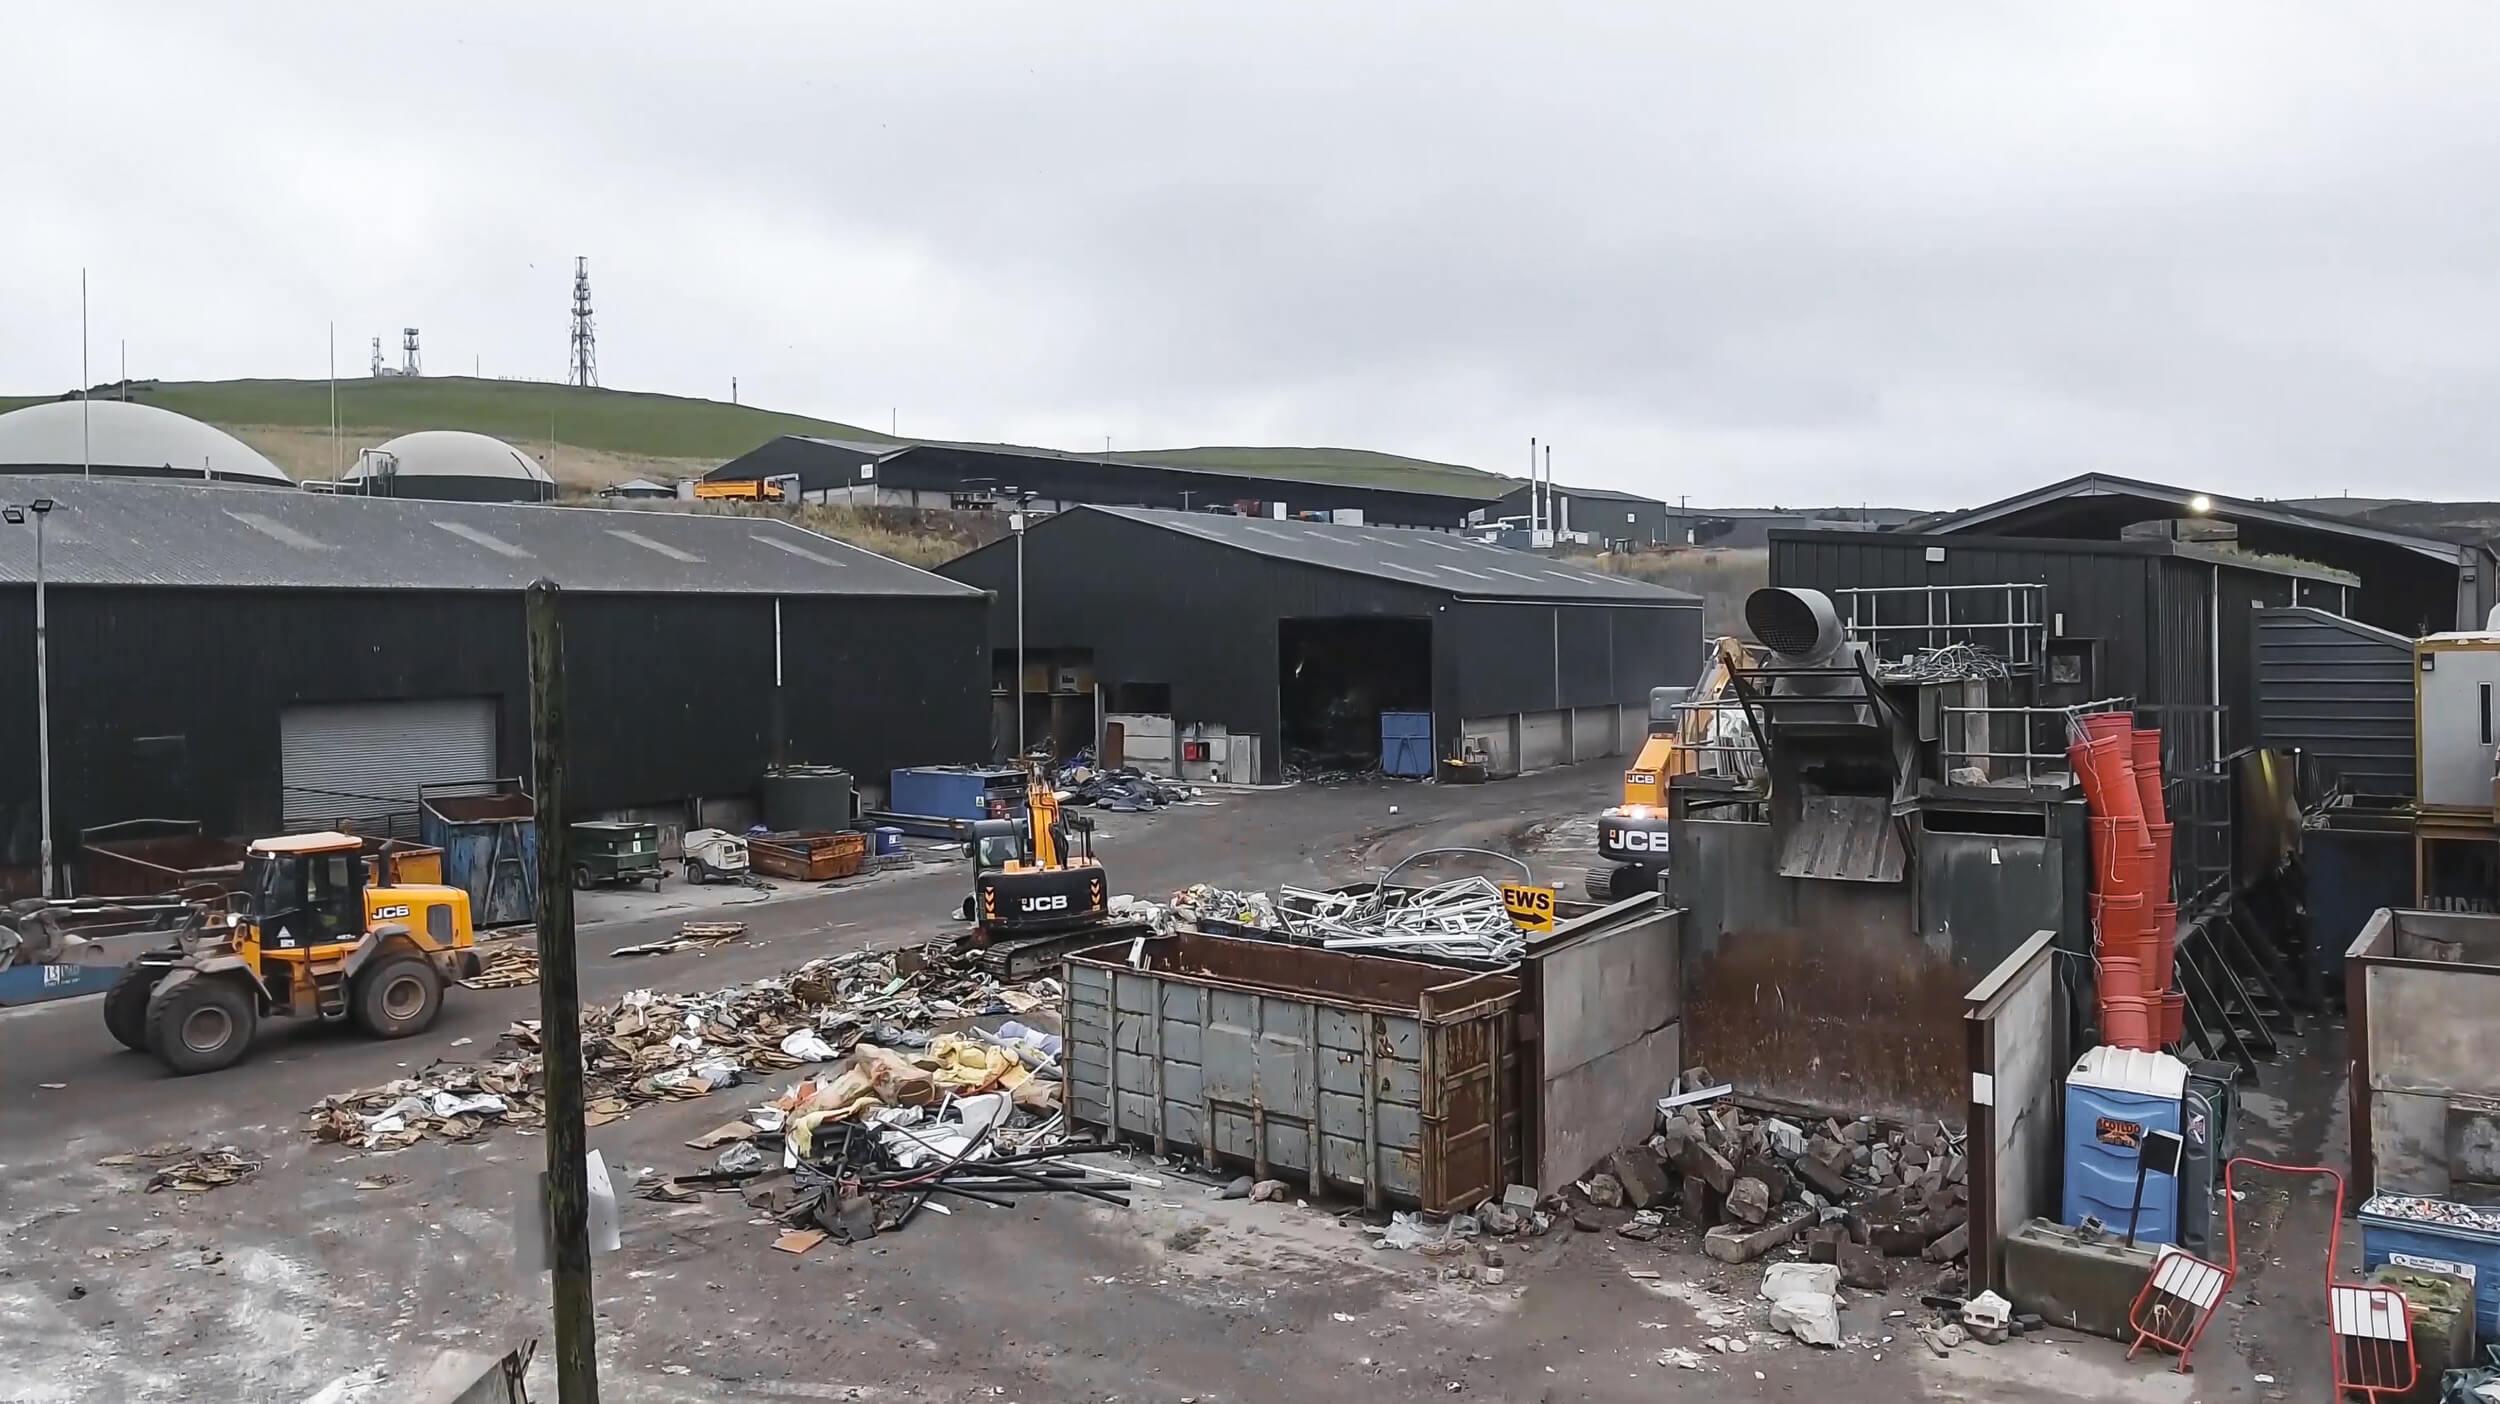 Binn Group Materialrecyclinganlage in Glenfarg, Schottland